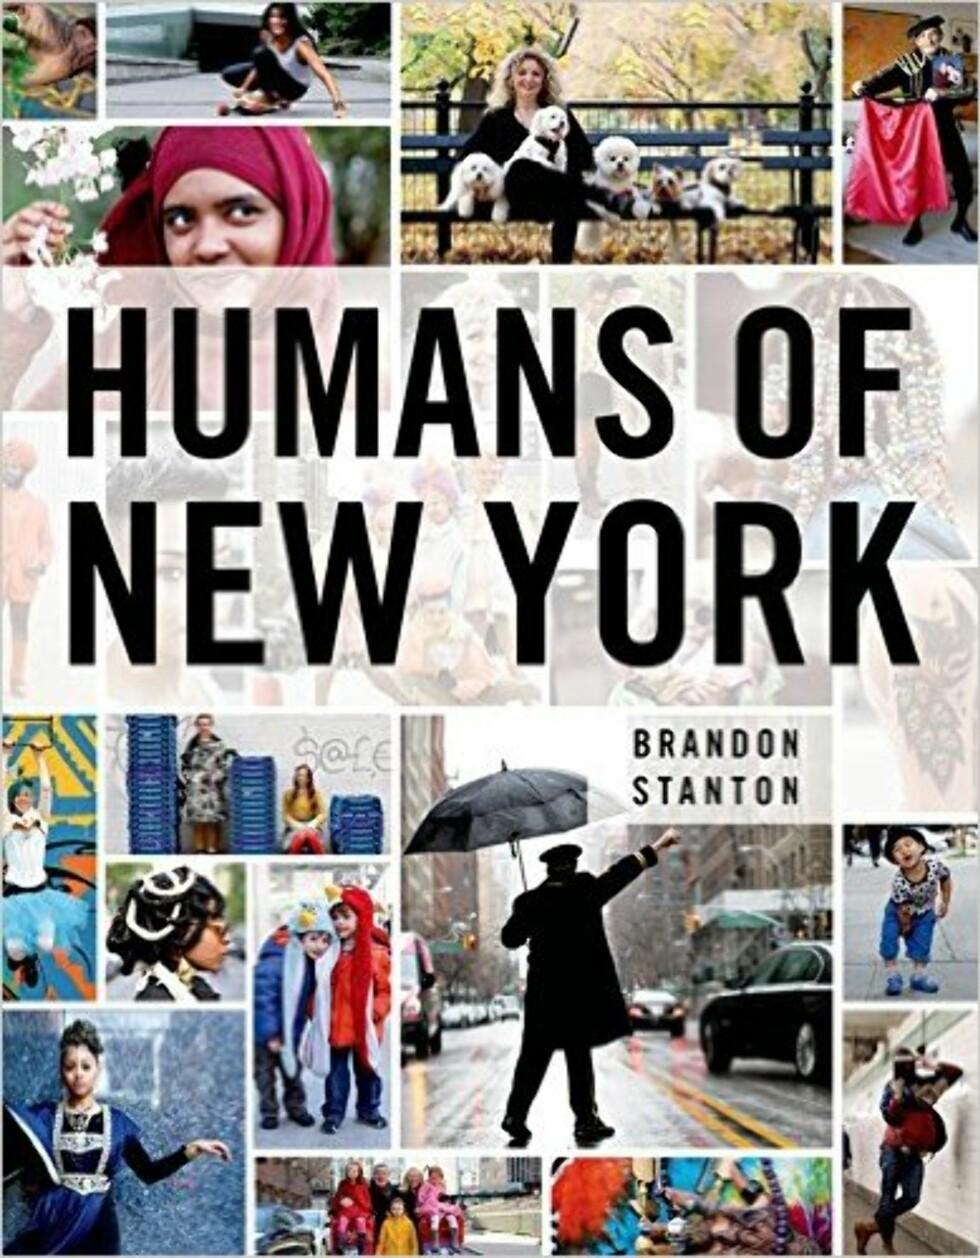 Humans Of New York via Amazon.com, kr 158.